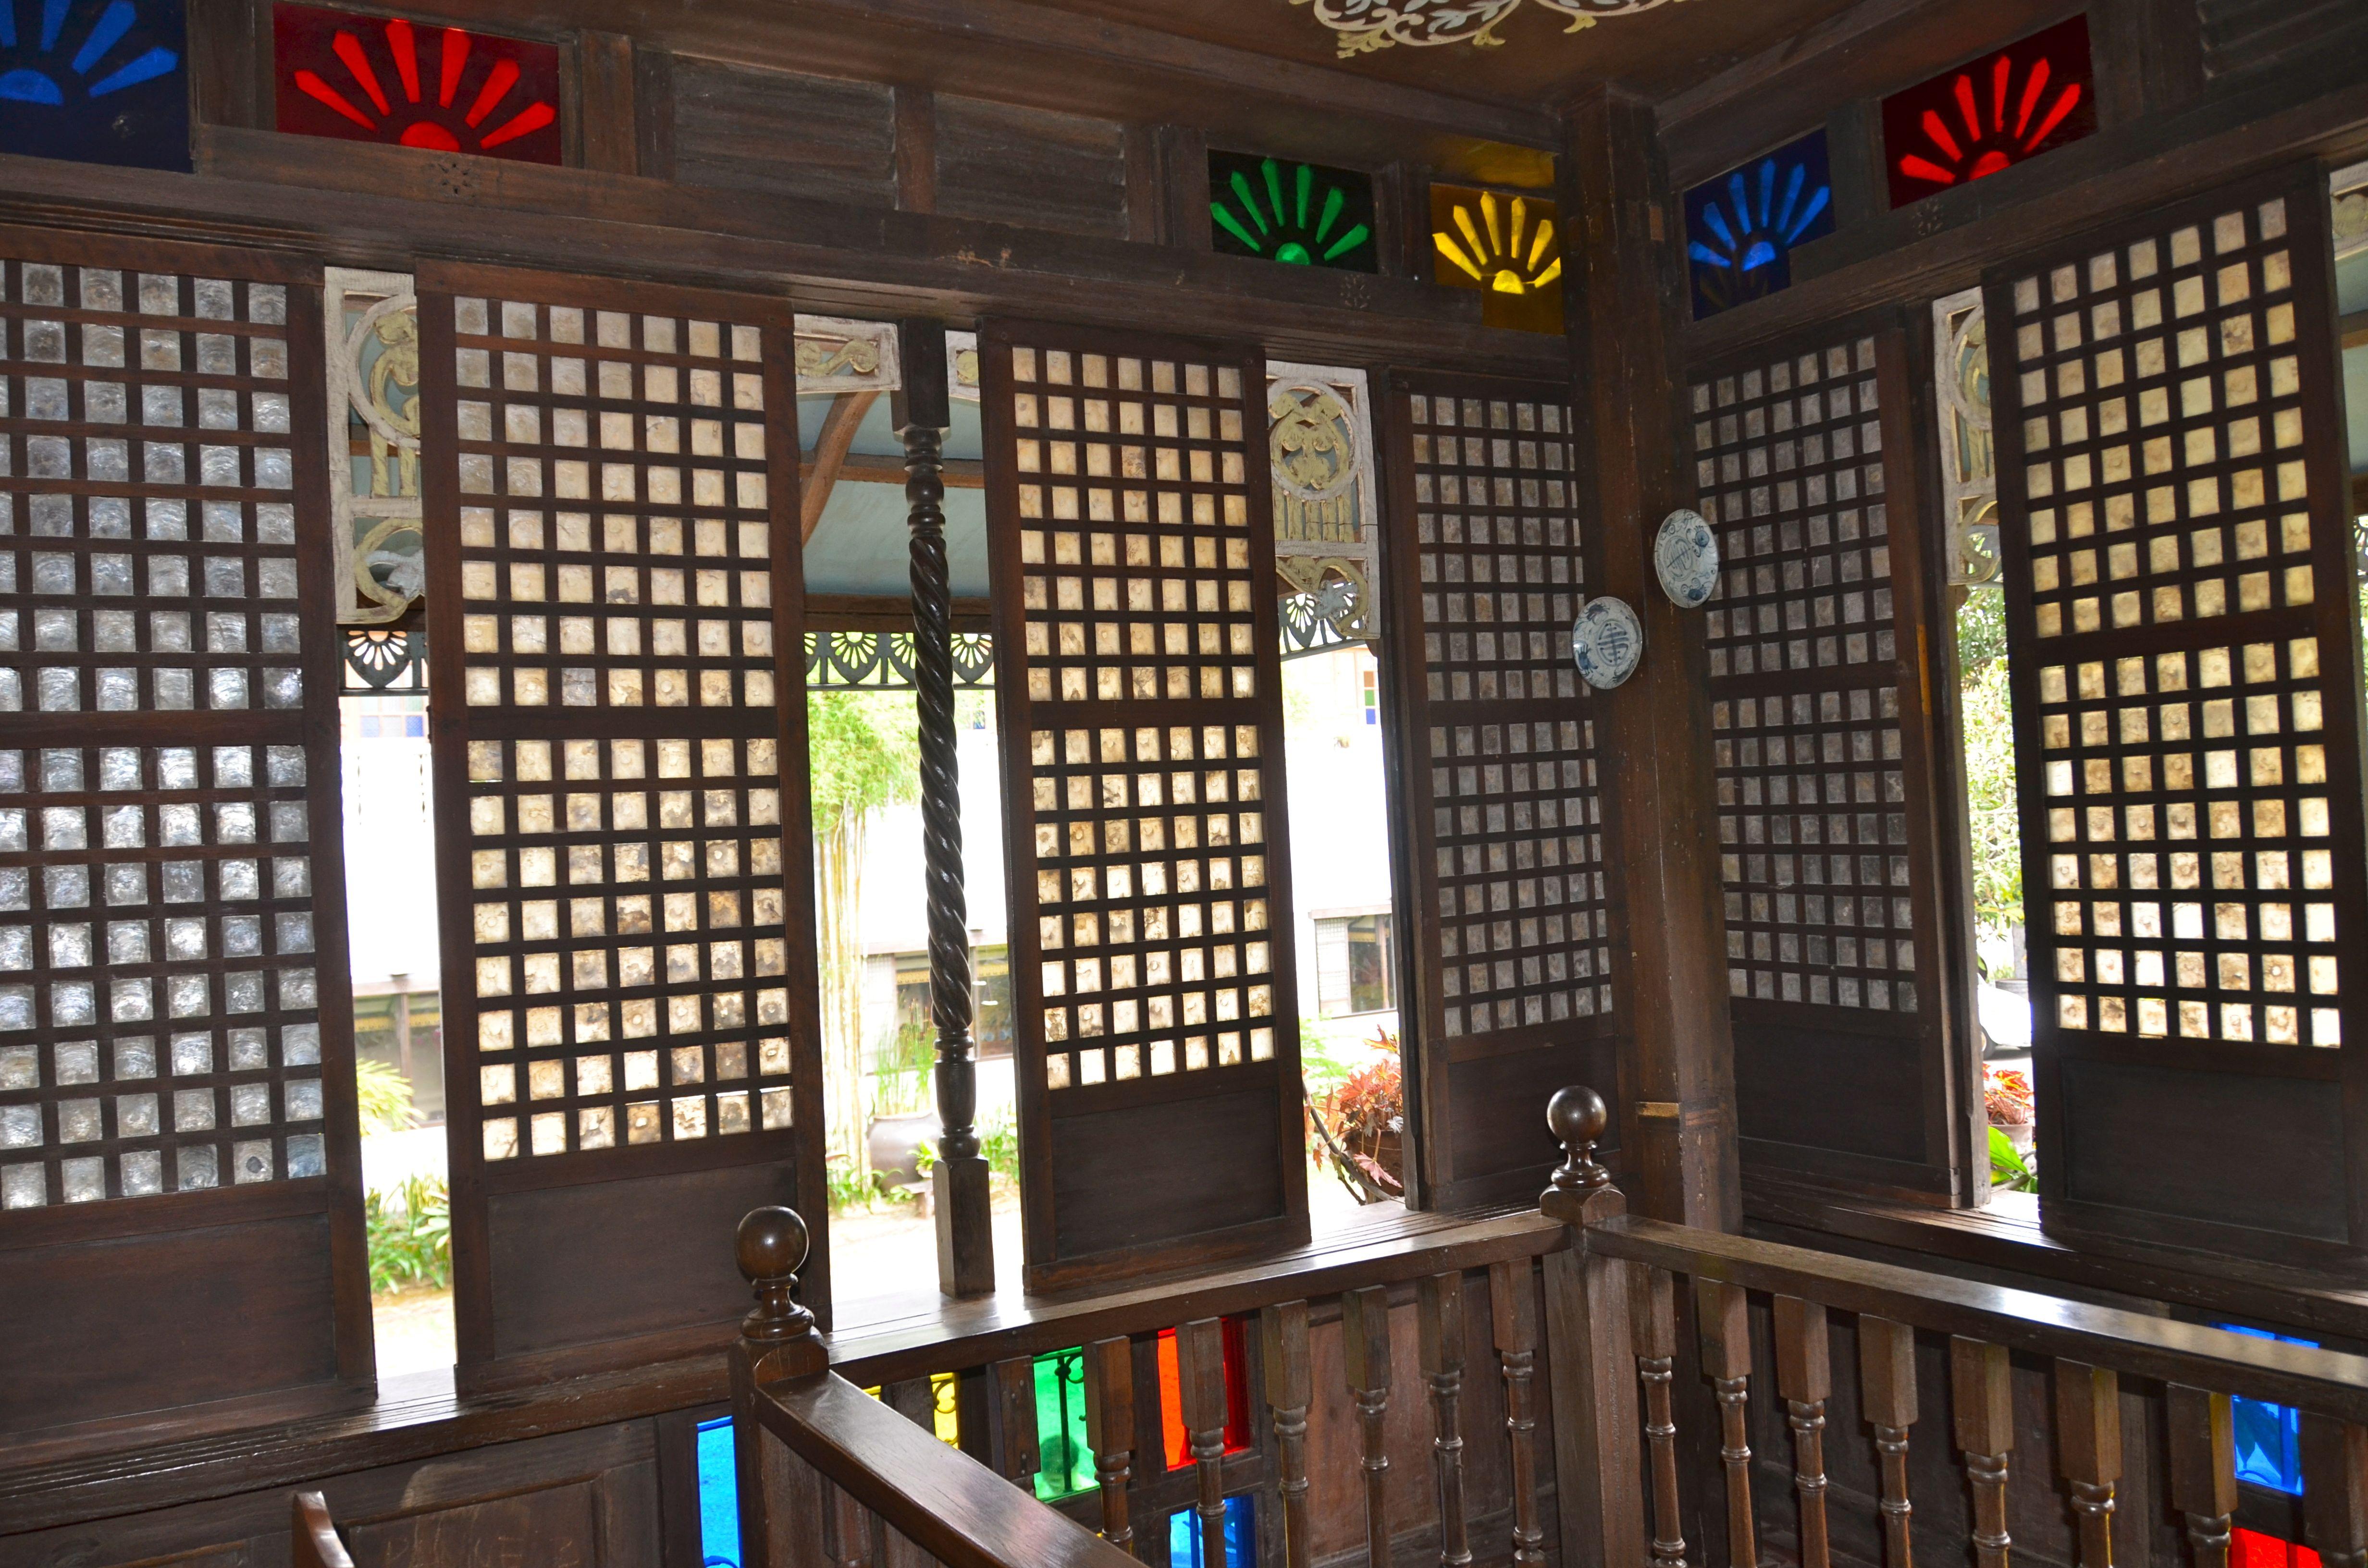 Capiz windows sulyap cafe philippine interiors and for Capiz window